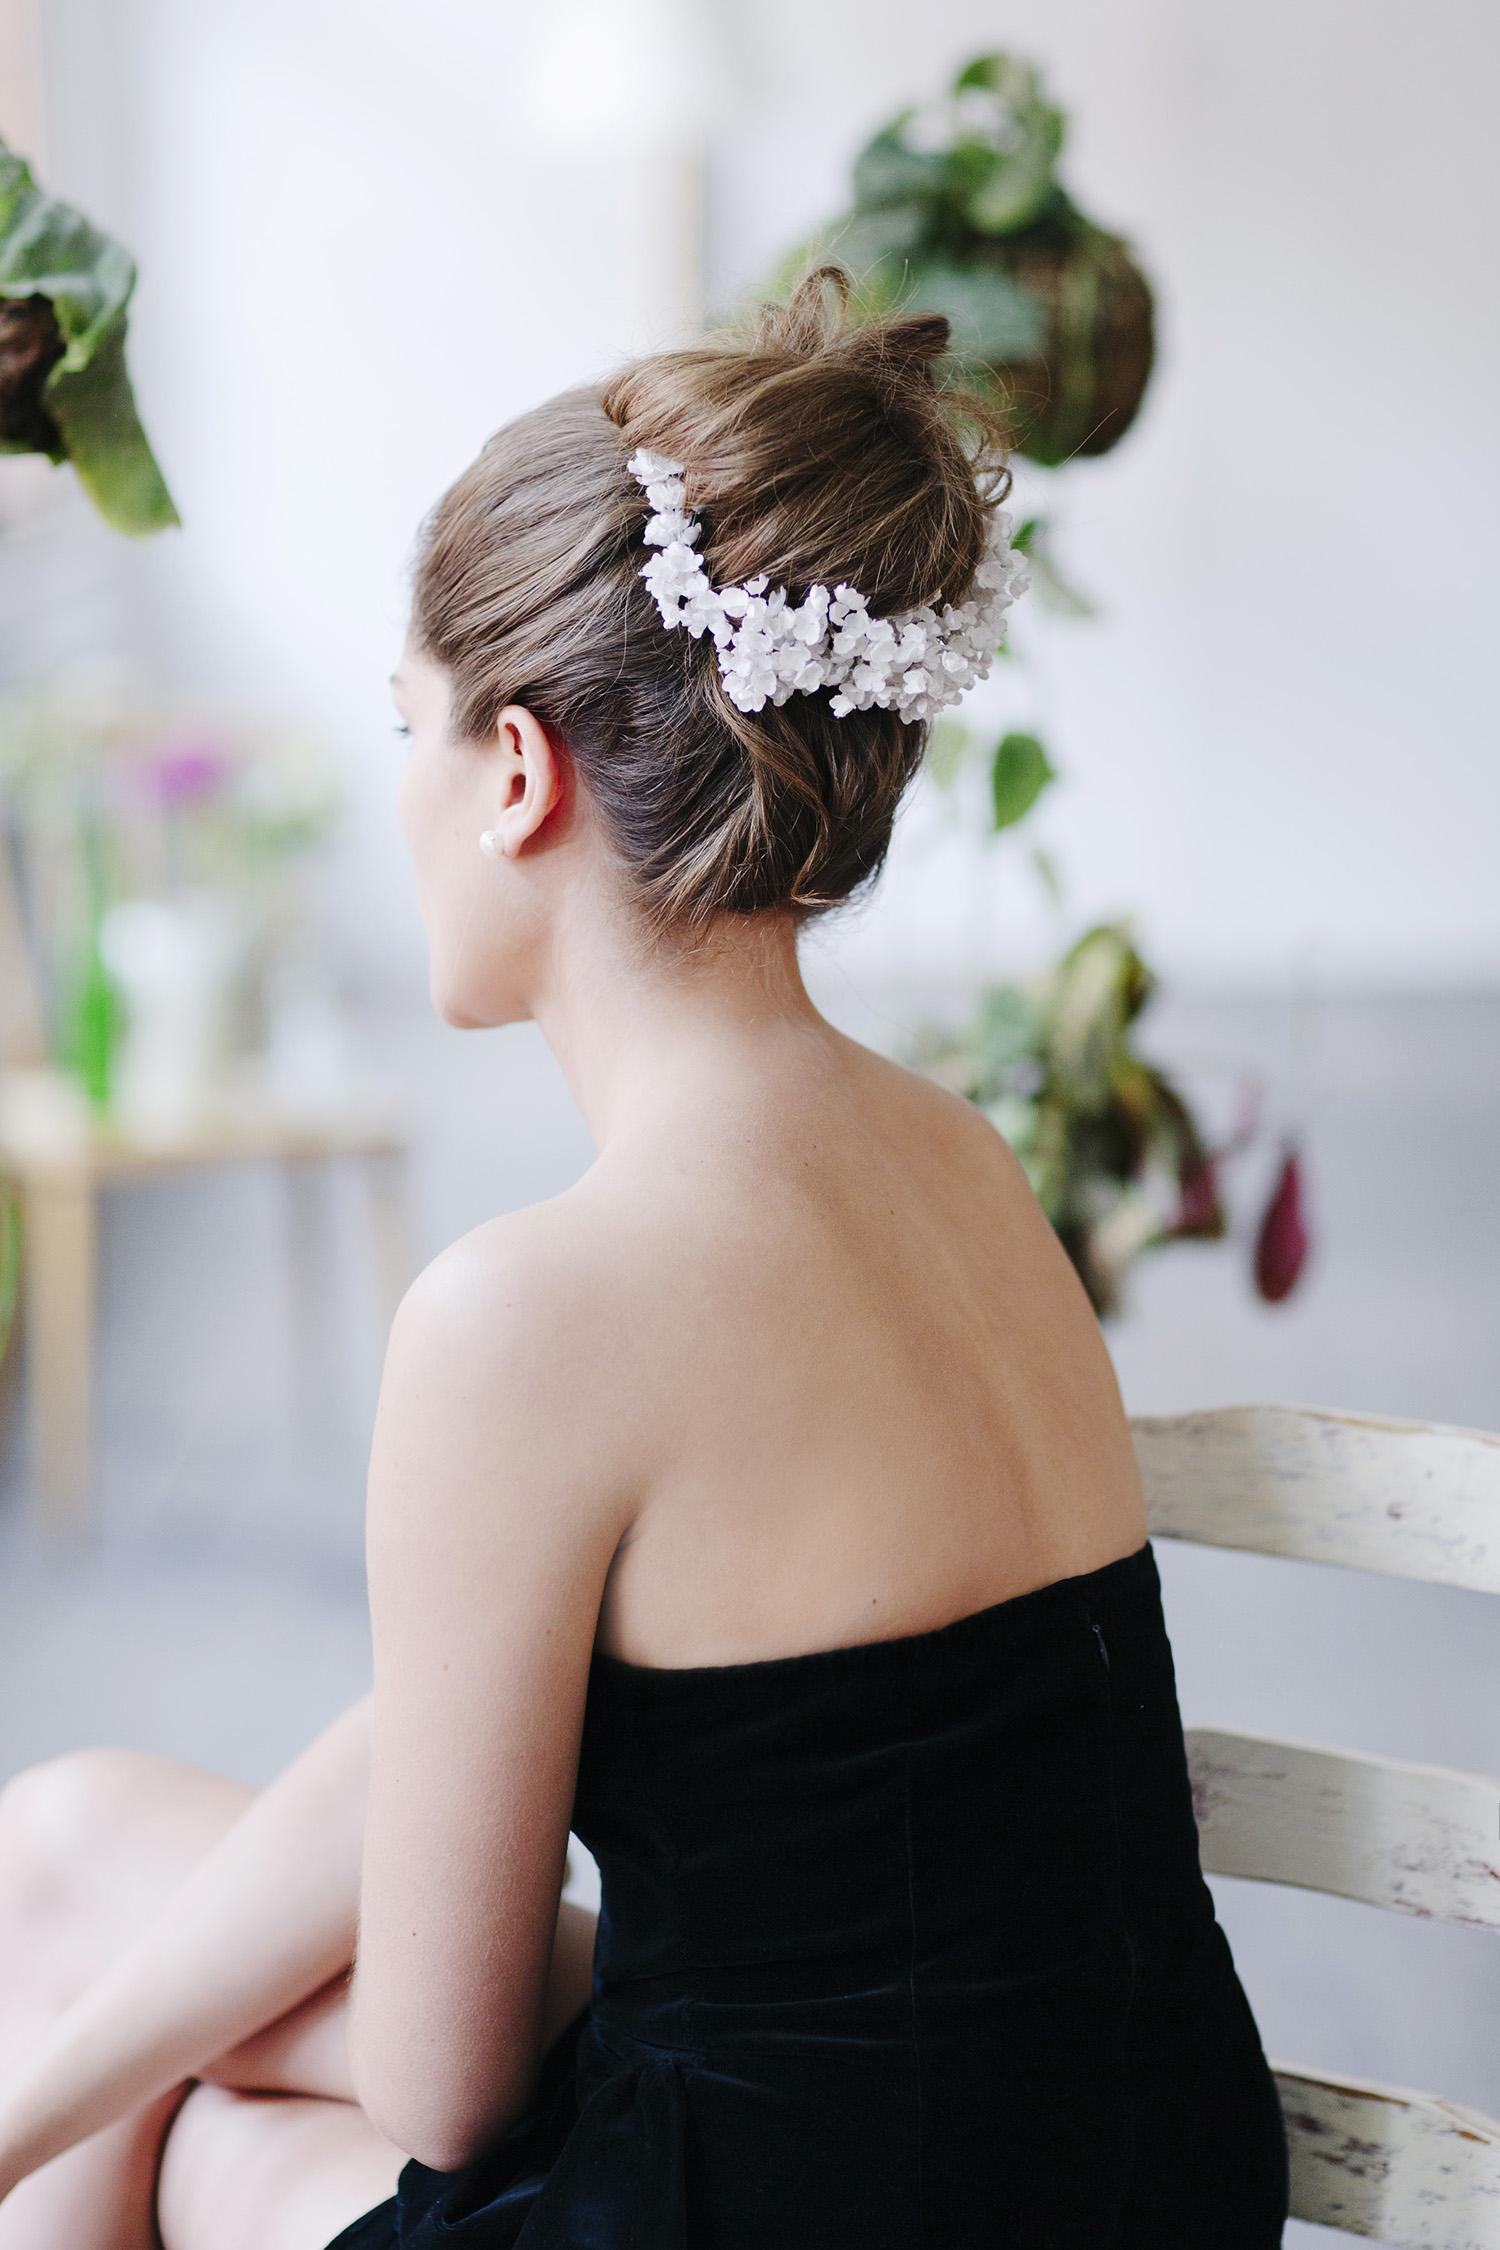 Hair Adornments - Kopfschmuck